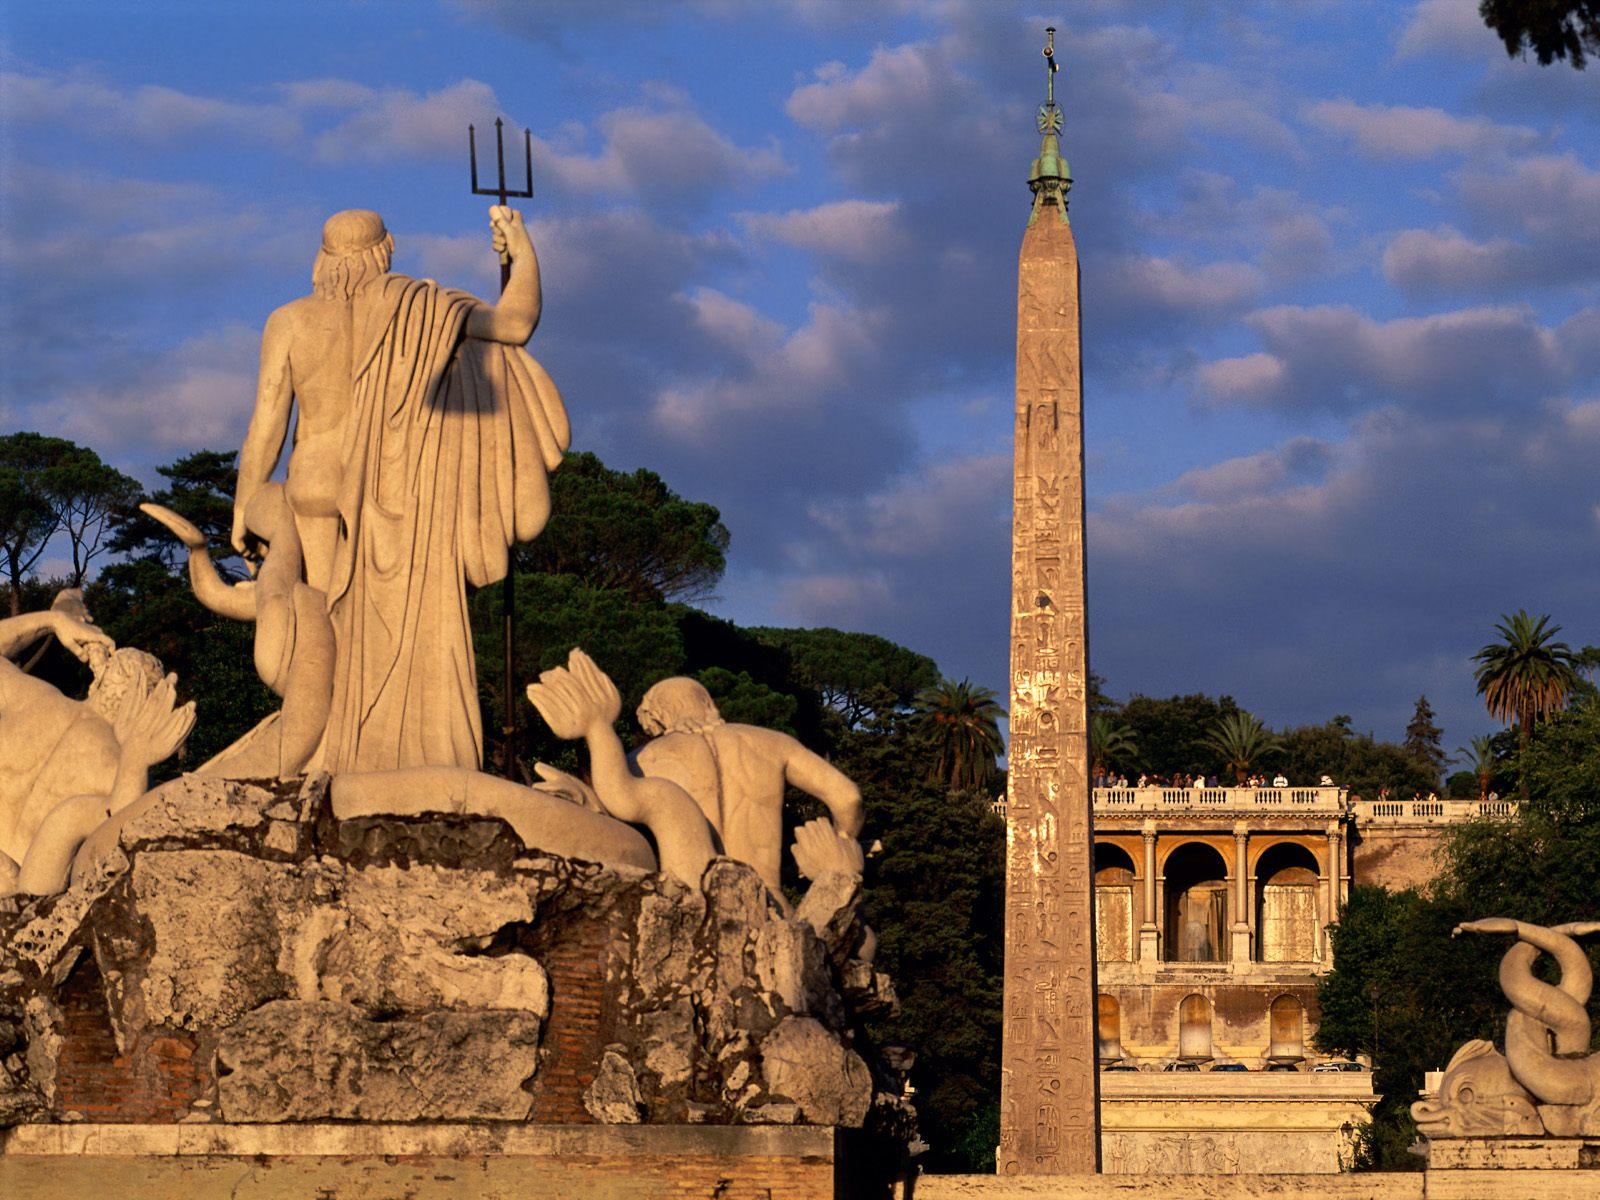 http://1.bp.blogspot.com/-RQ9TGdyOpGE/Tcp4R7Xt4_I/AAAAAAAACXg/Uo1arxvwfbQ/s1600/Piazza+del+Popolo%252C+Rome%252C+Italy.jpg